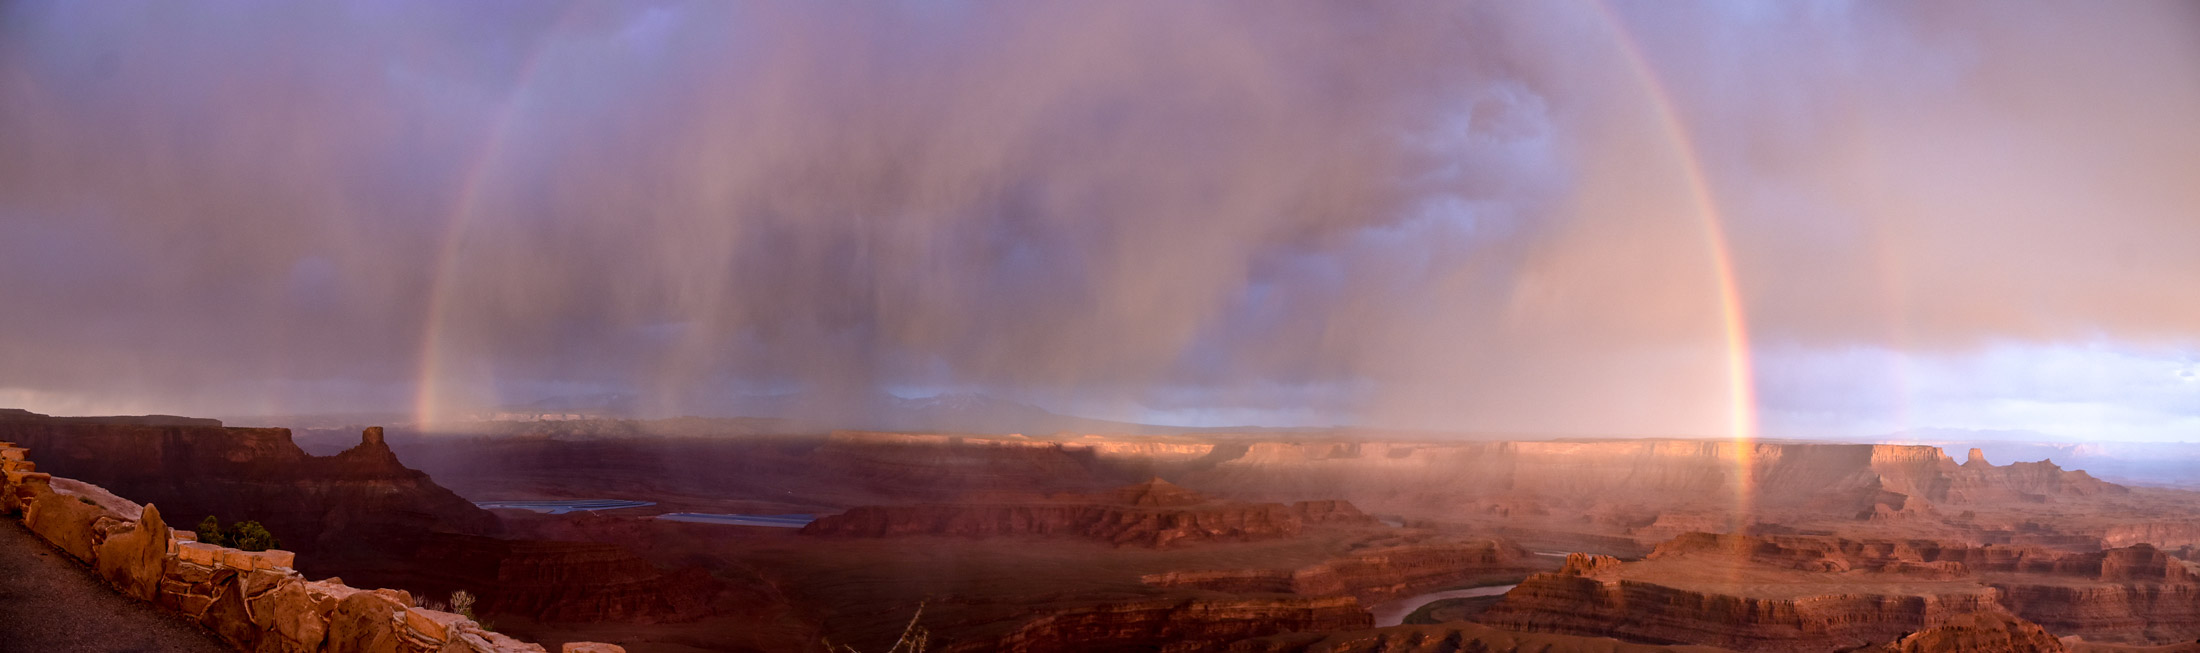 Utah-Moab-Arches-National-Park_12